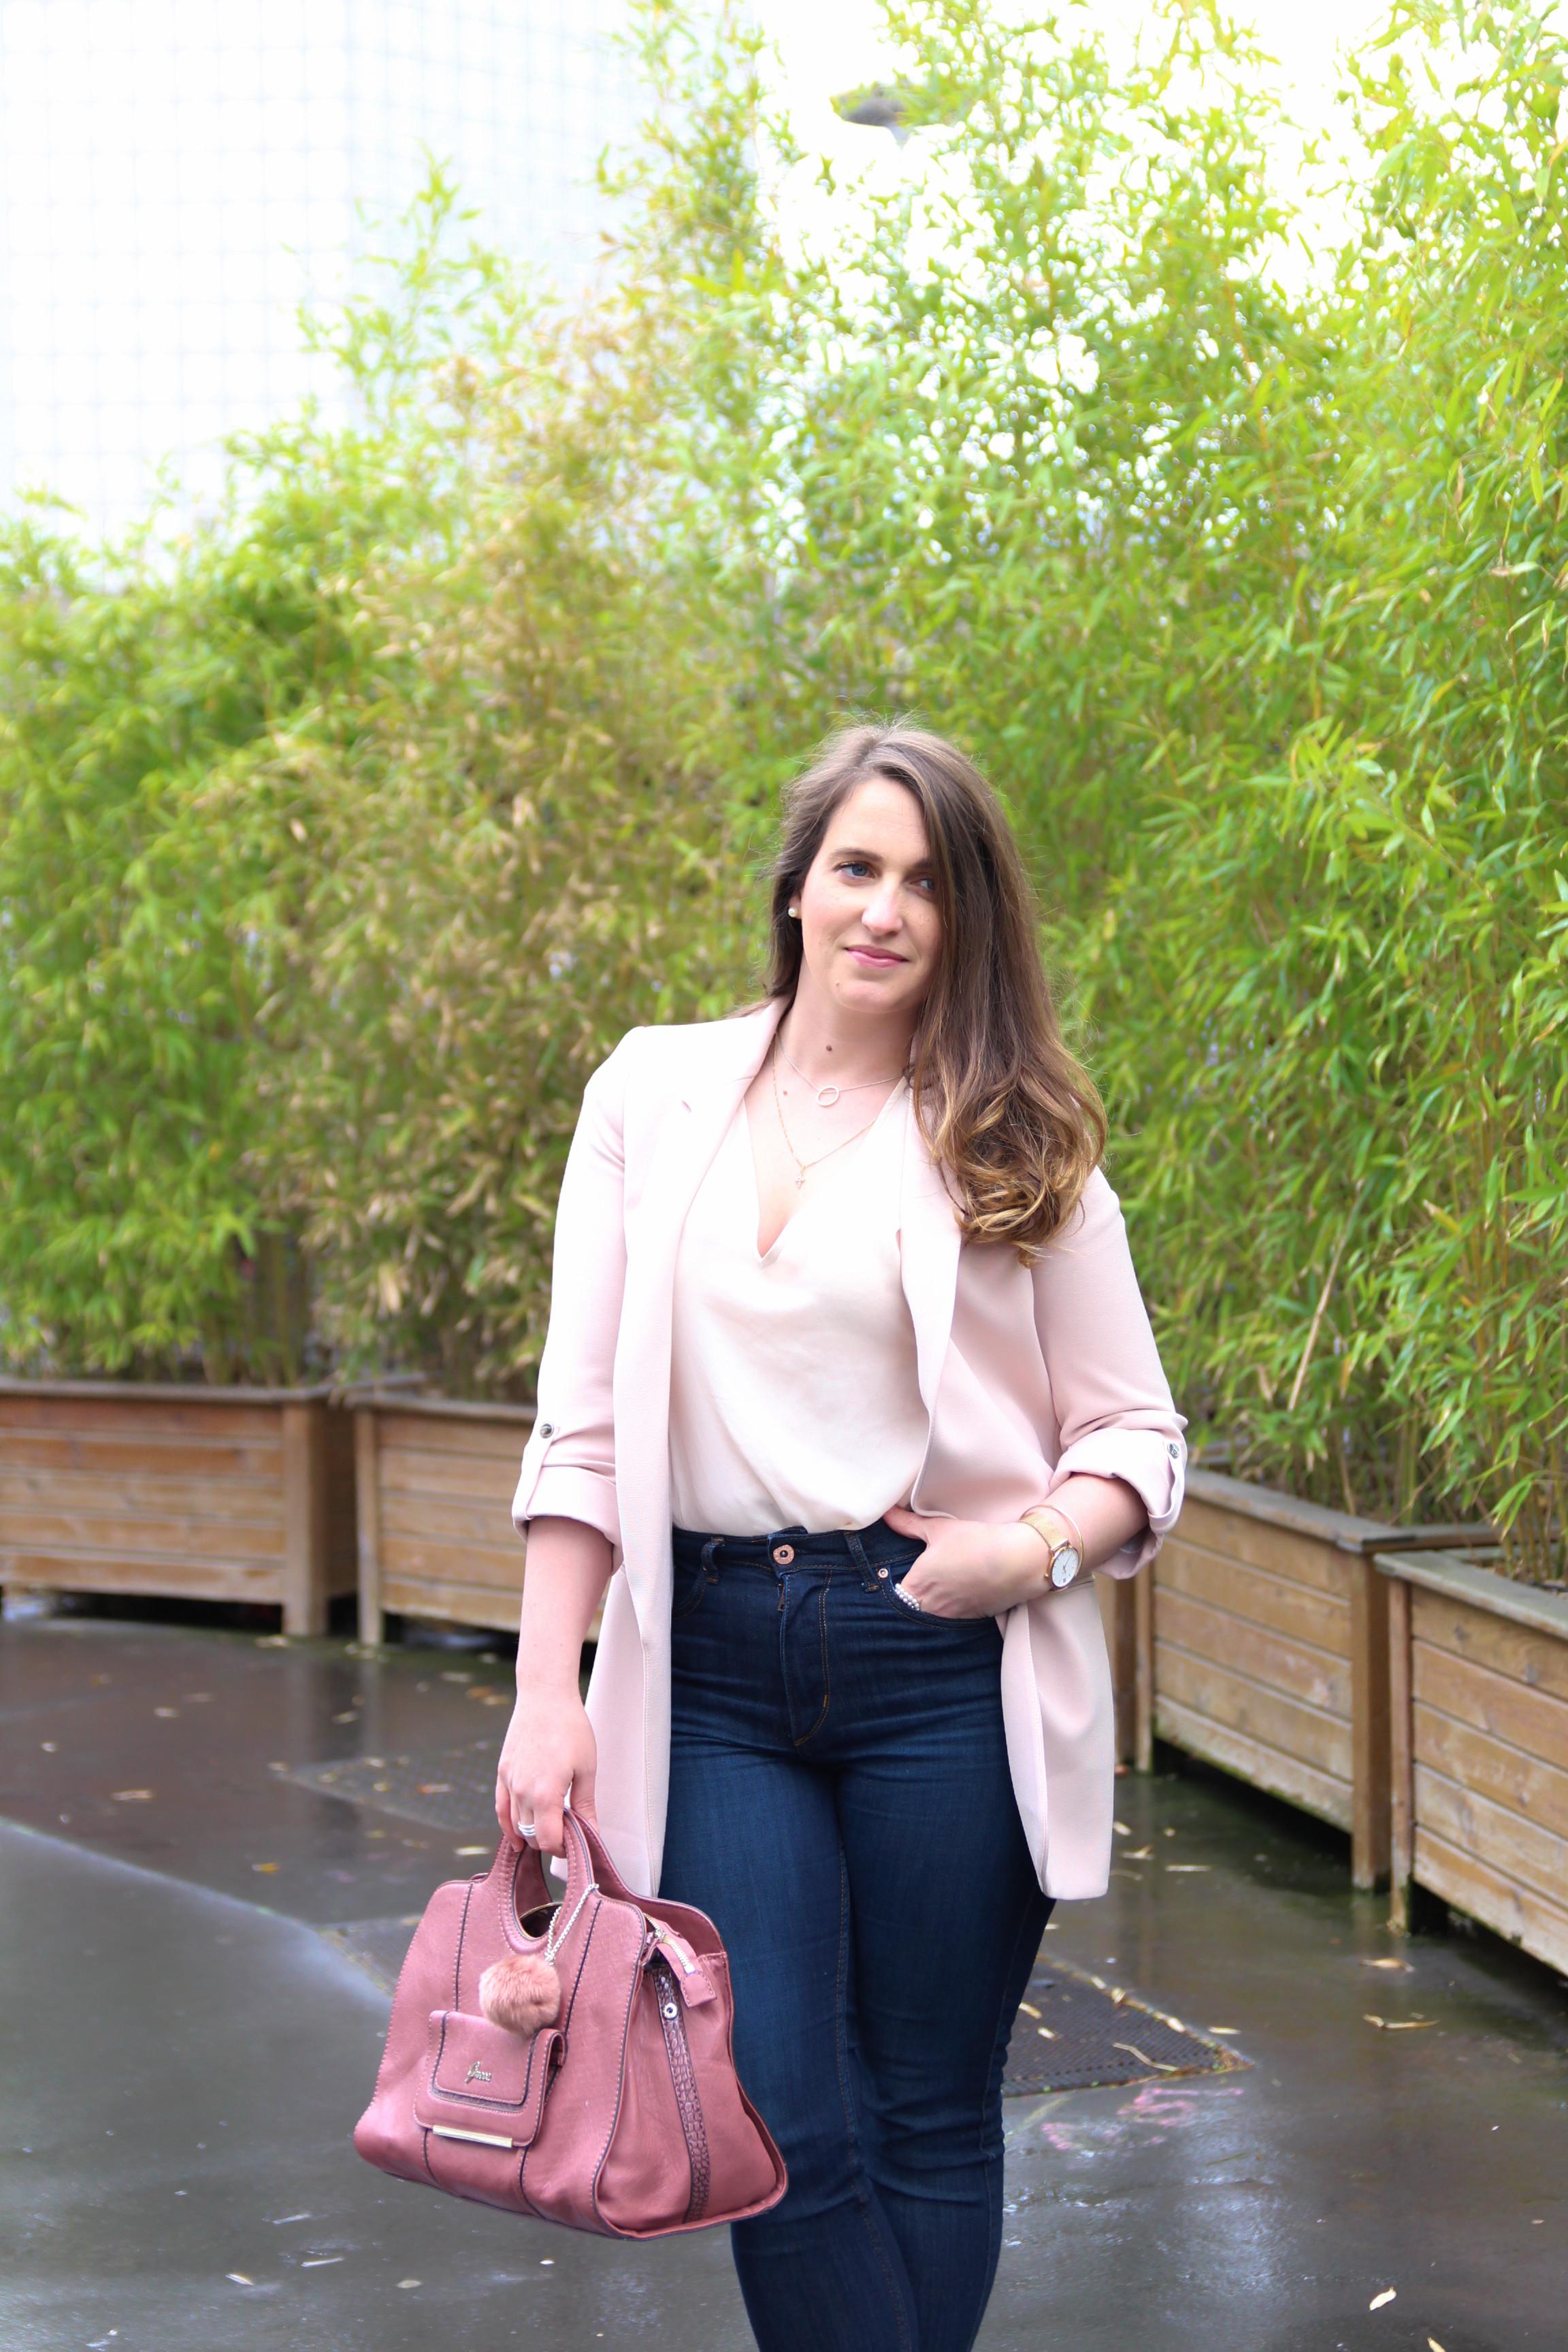 fashionblogger-influencer-jacket-zara-rosepastel-paris-seralynepointcom-114414